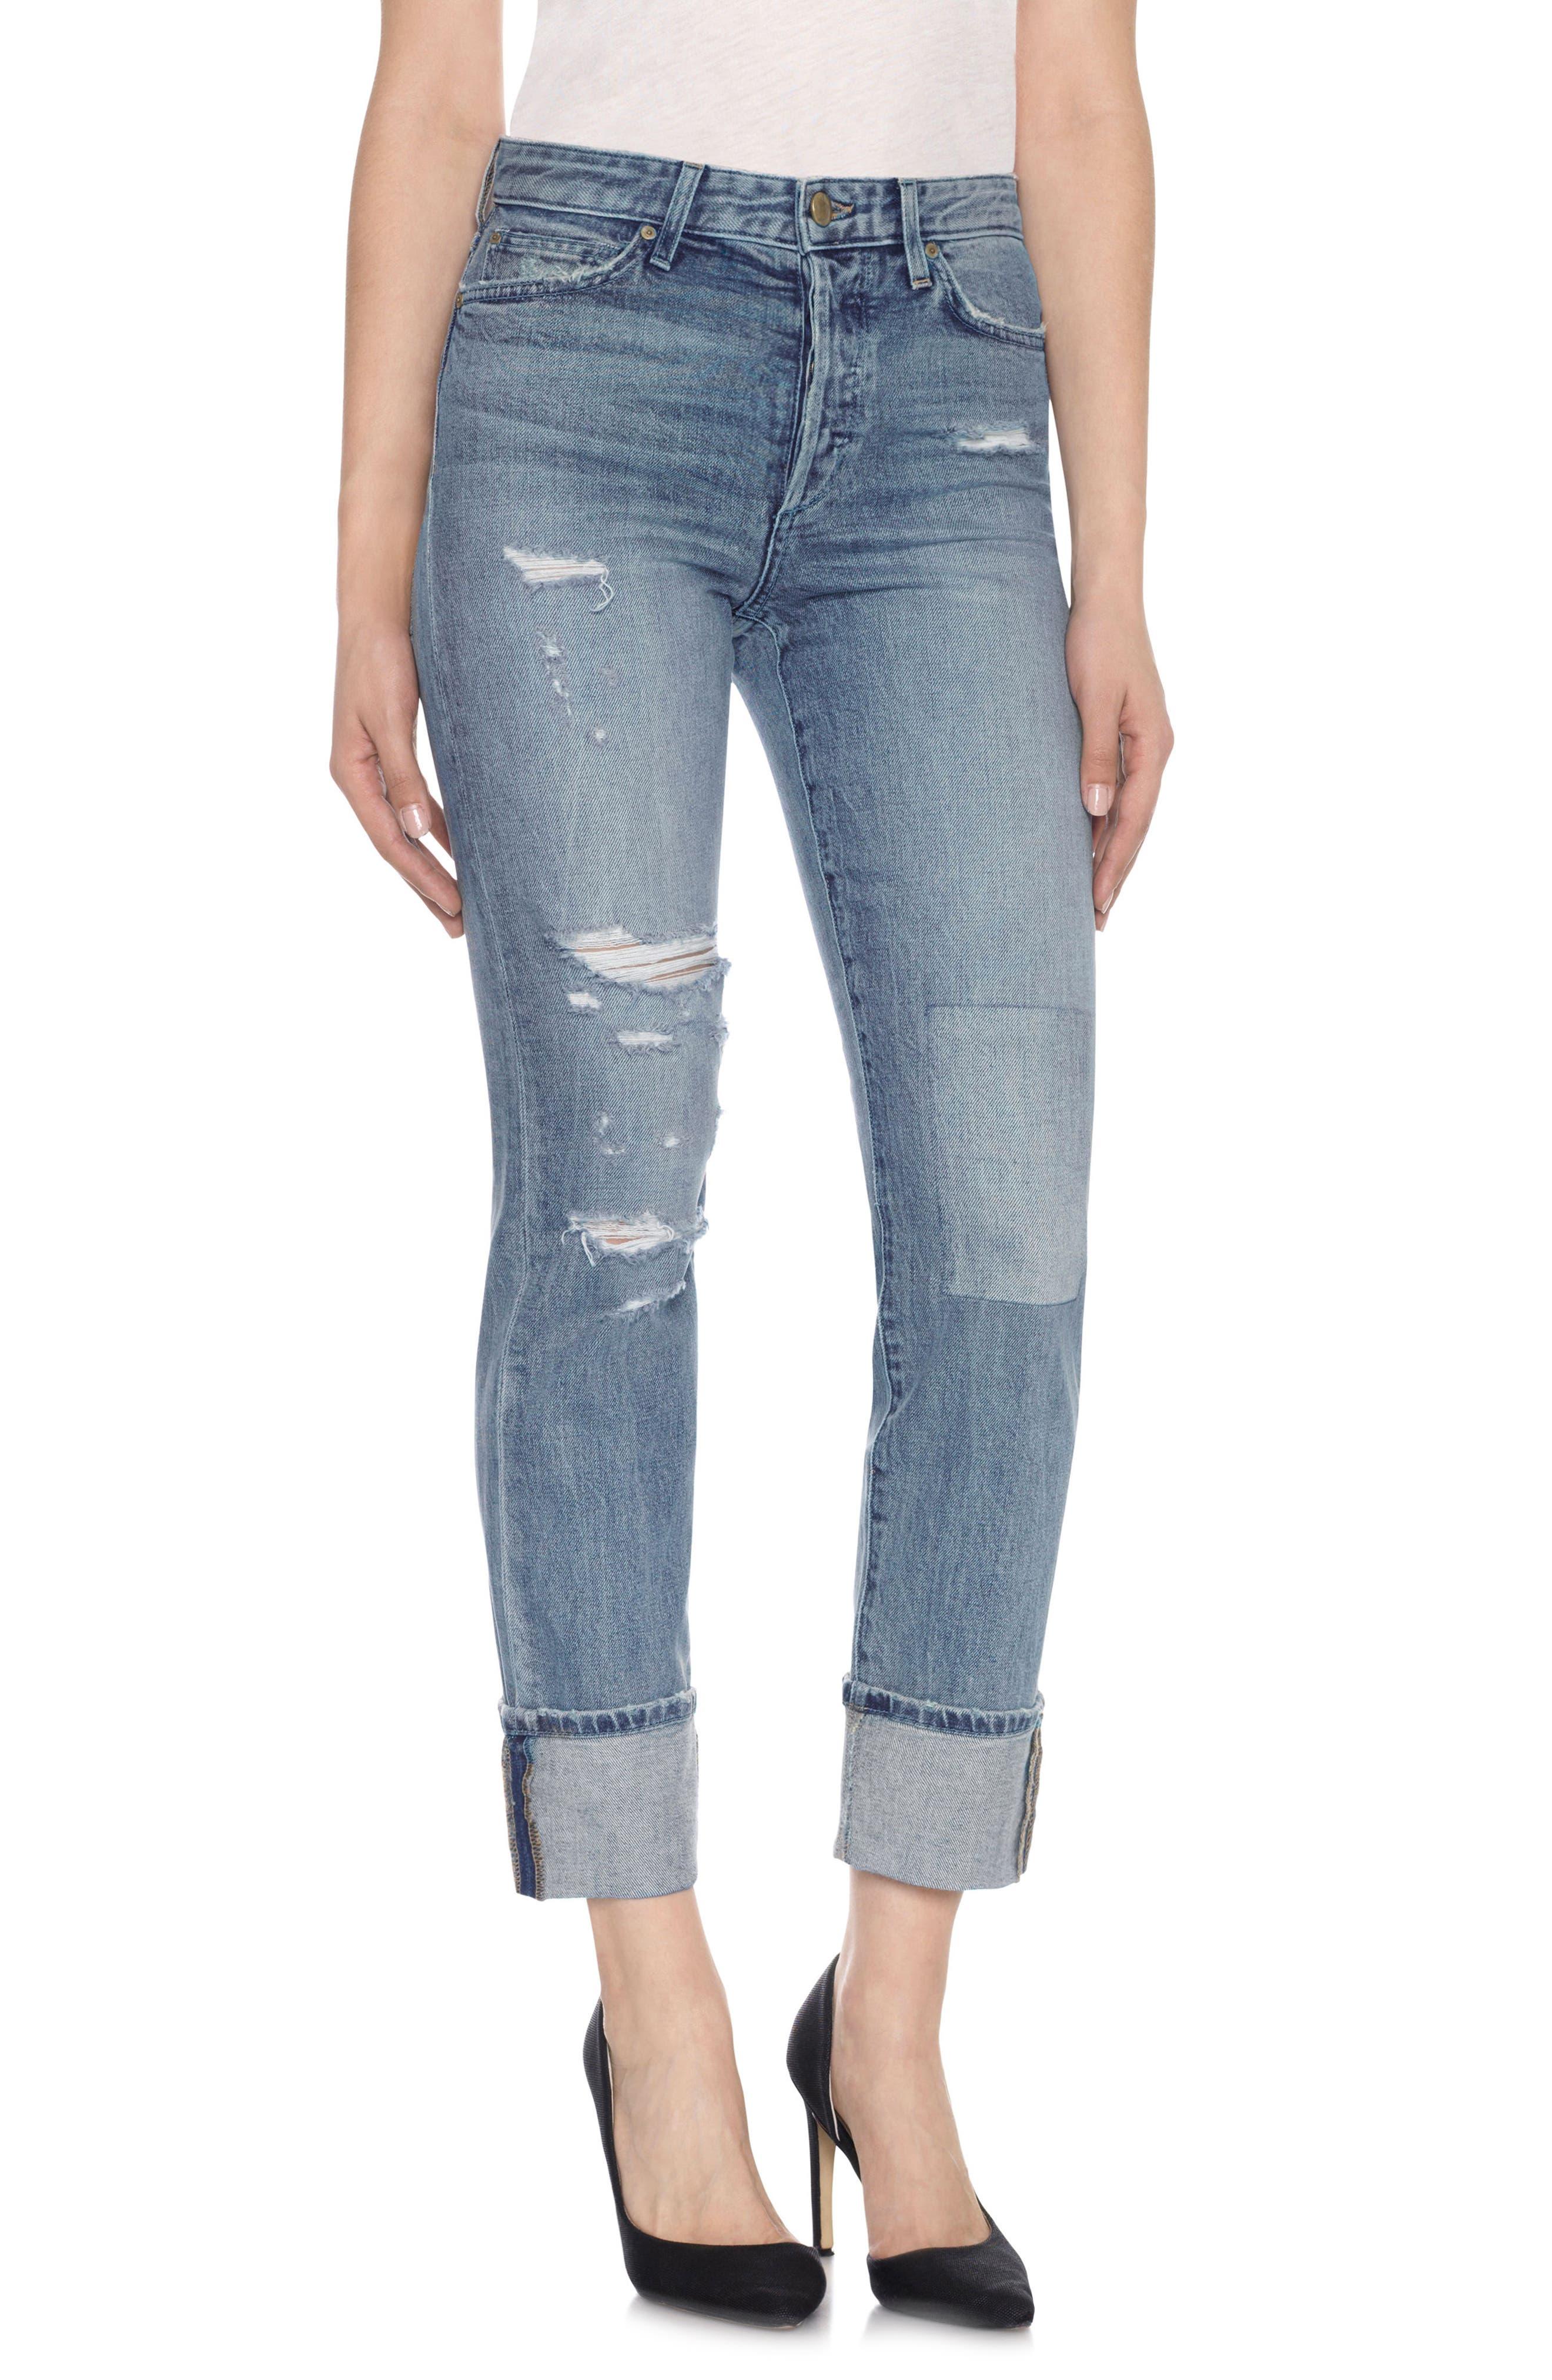 Taylor Hill x Joe's Debbie Cuff Straight Leg Jeans,                         Main,                         color, Jaylee